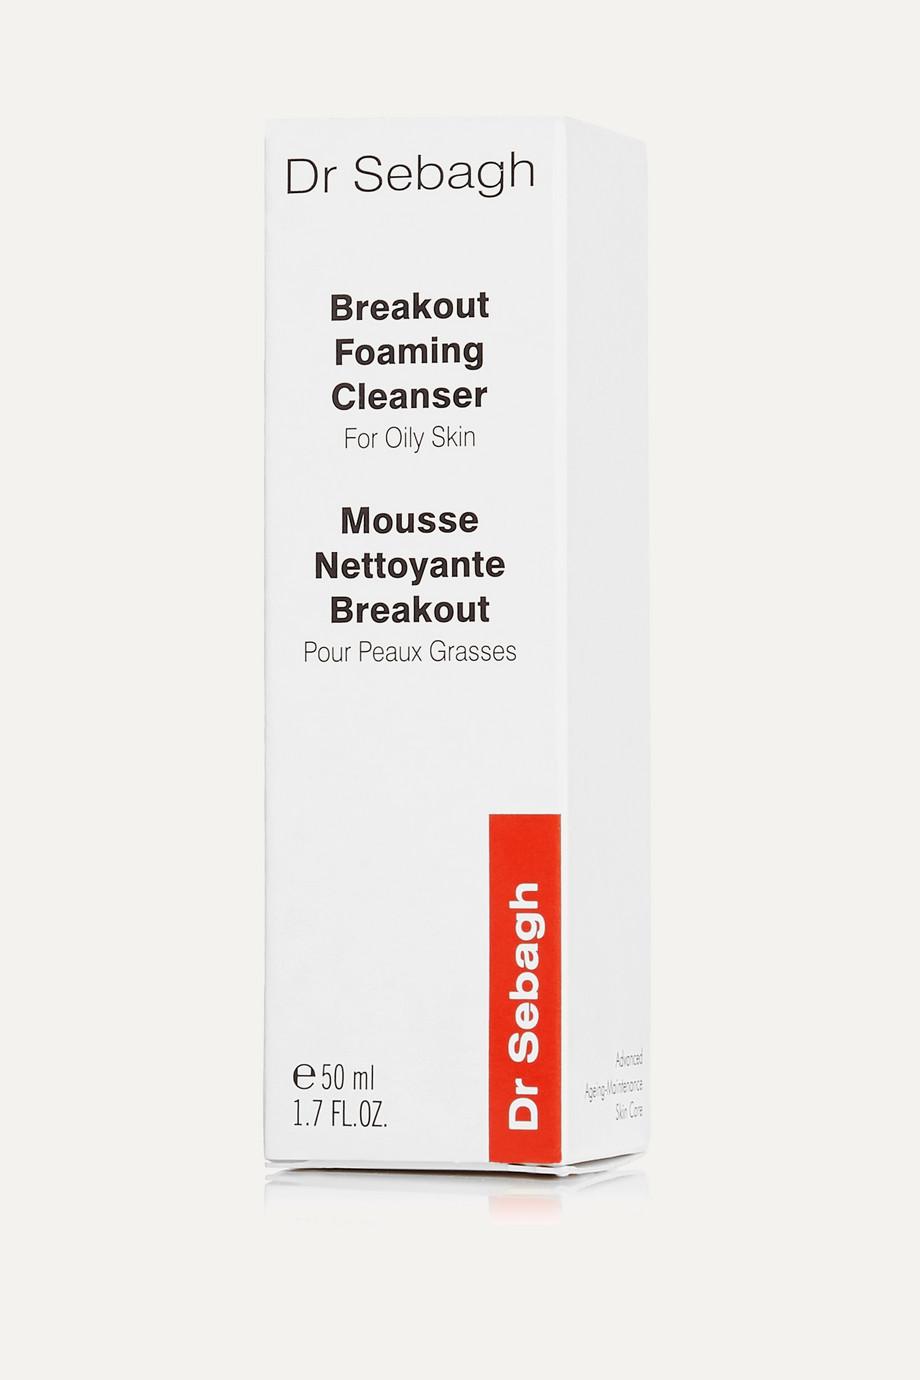 Dr Sebagh Breakout Foaming Cleanser, 50ml